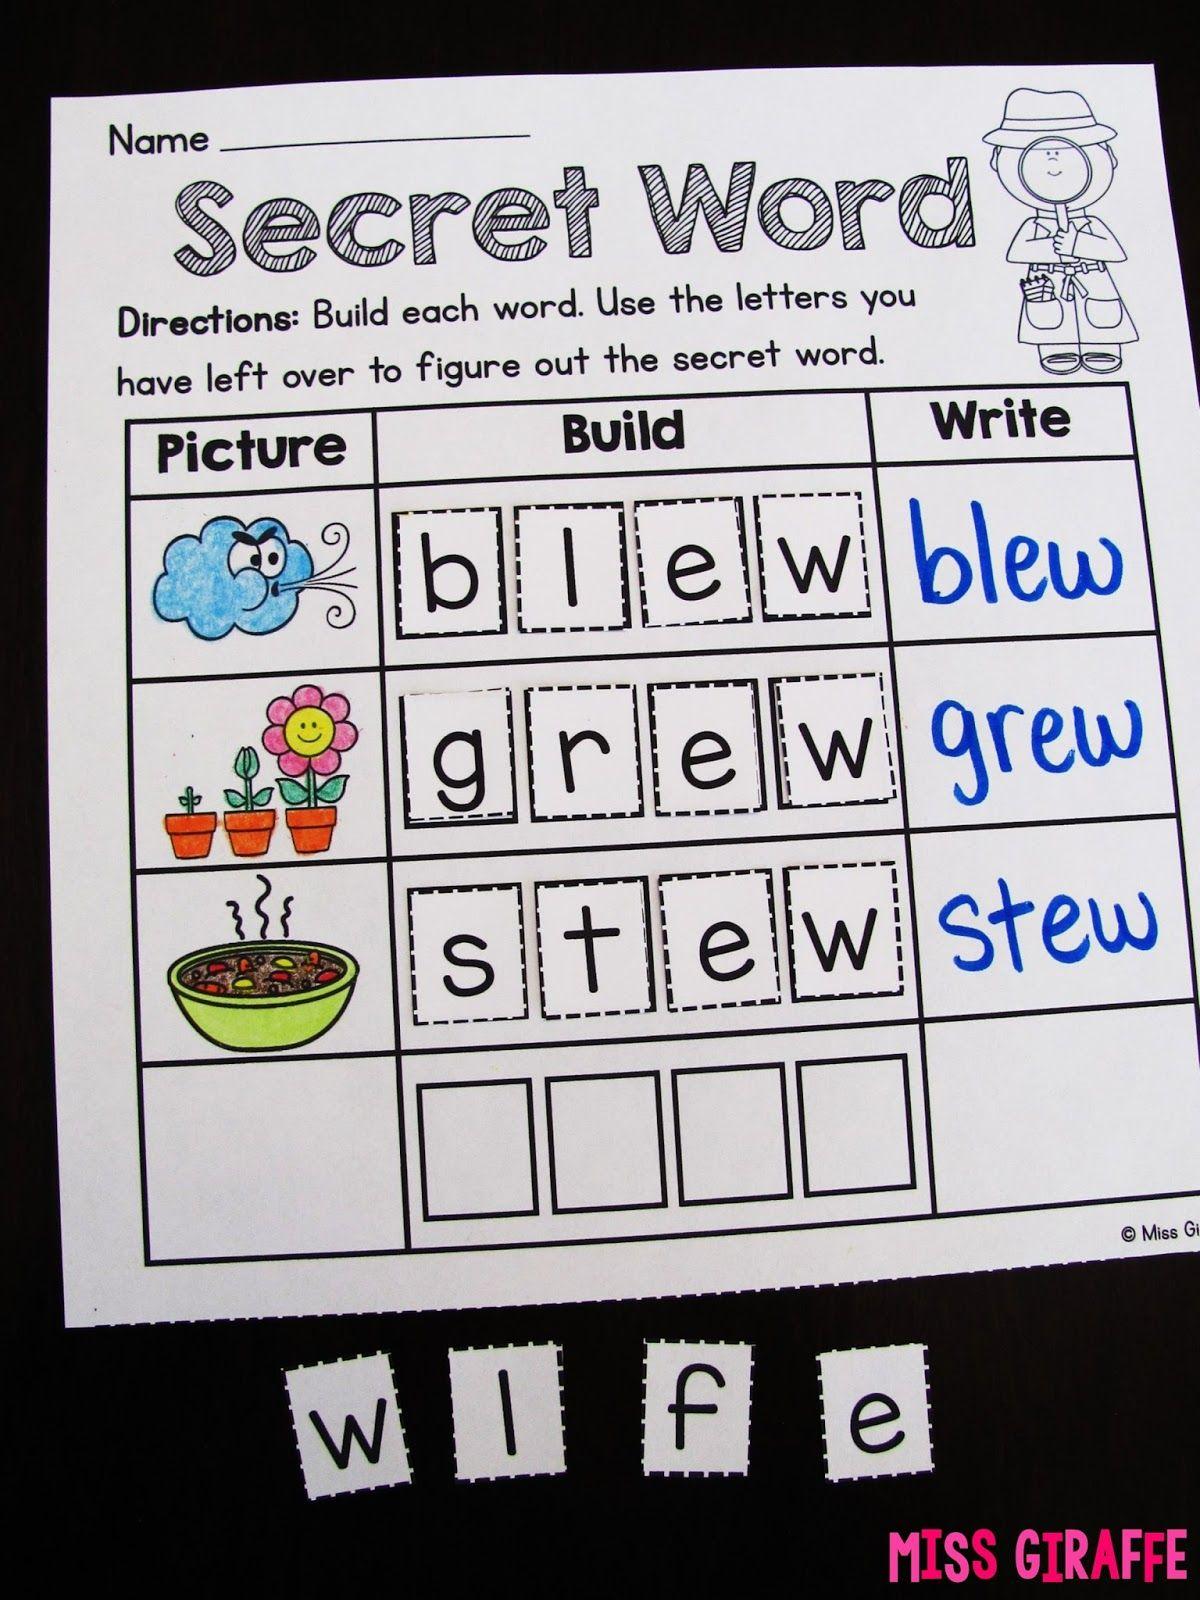 worksheet Ui Phonics Worksheets np secretwordws jpg education pinterest explore phonics worksheets games and more